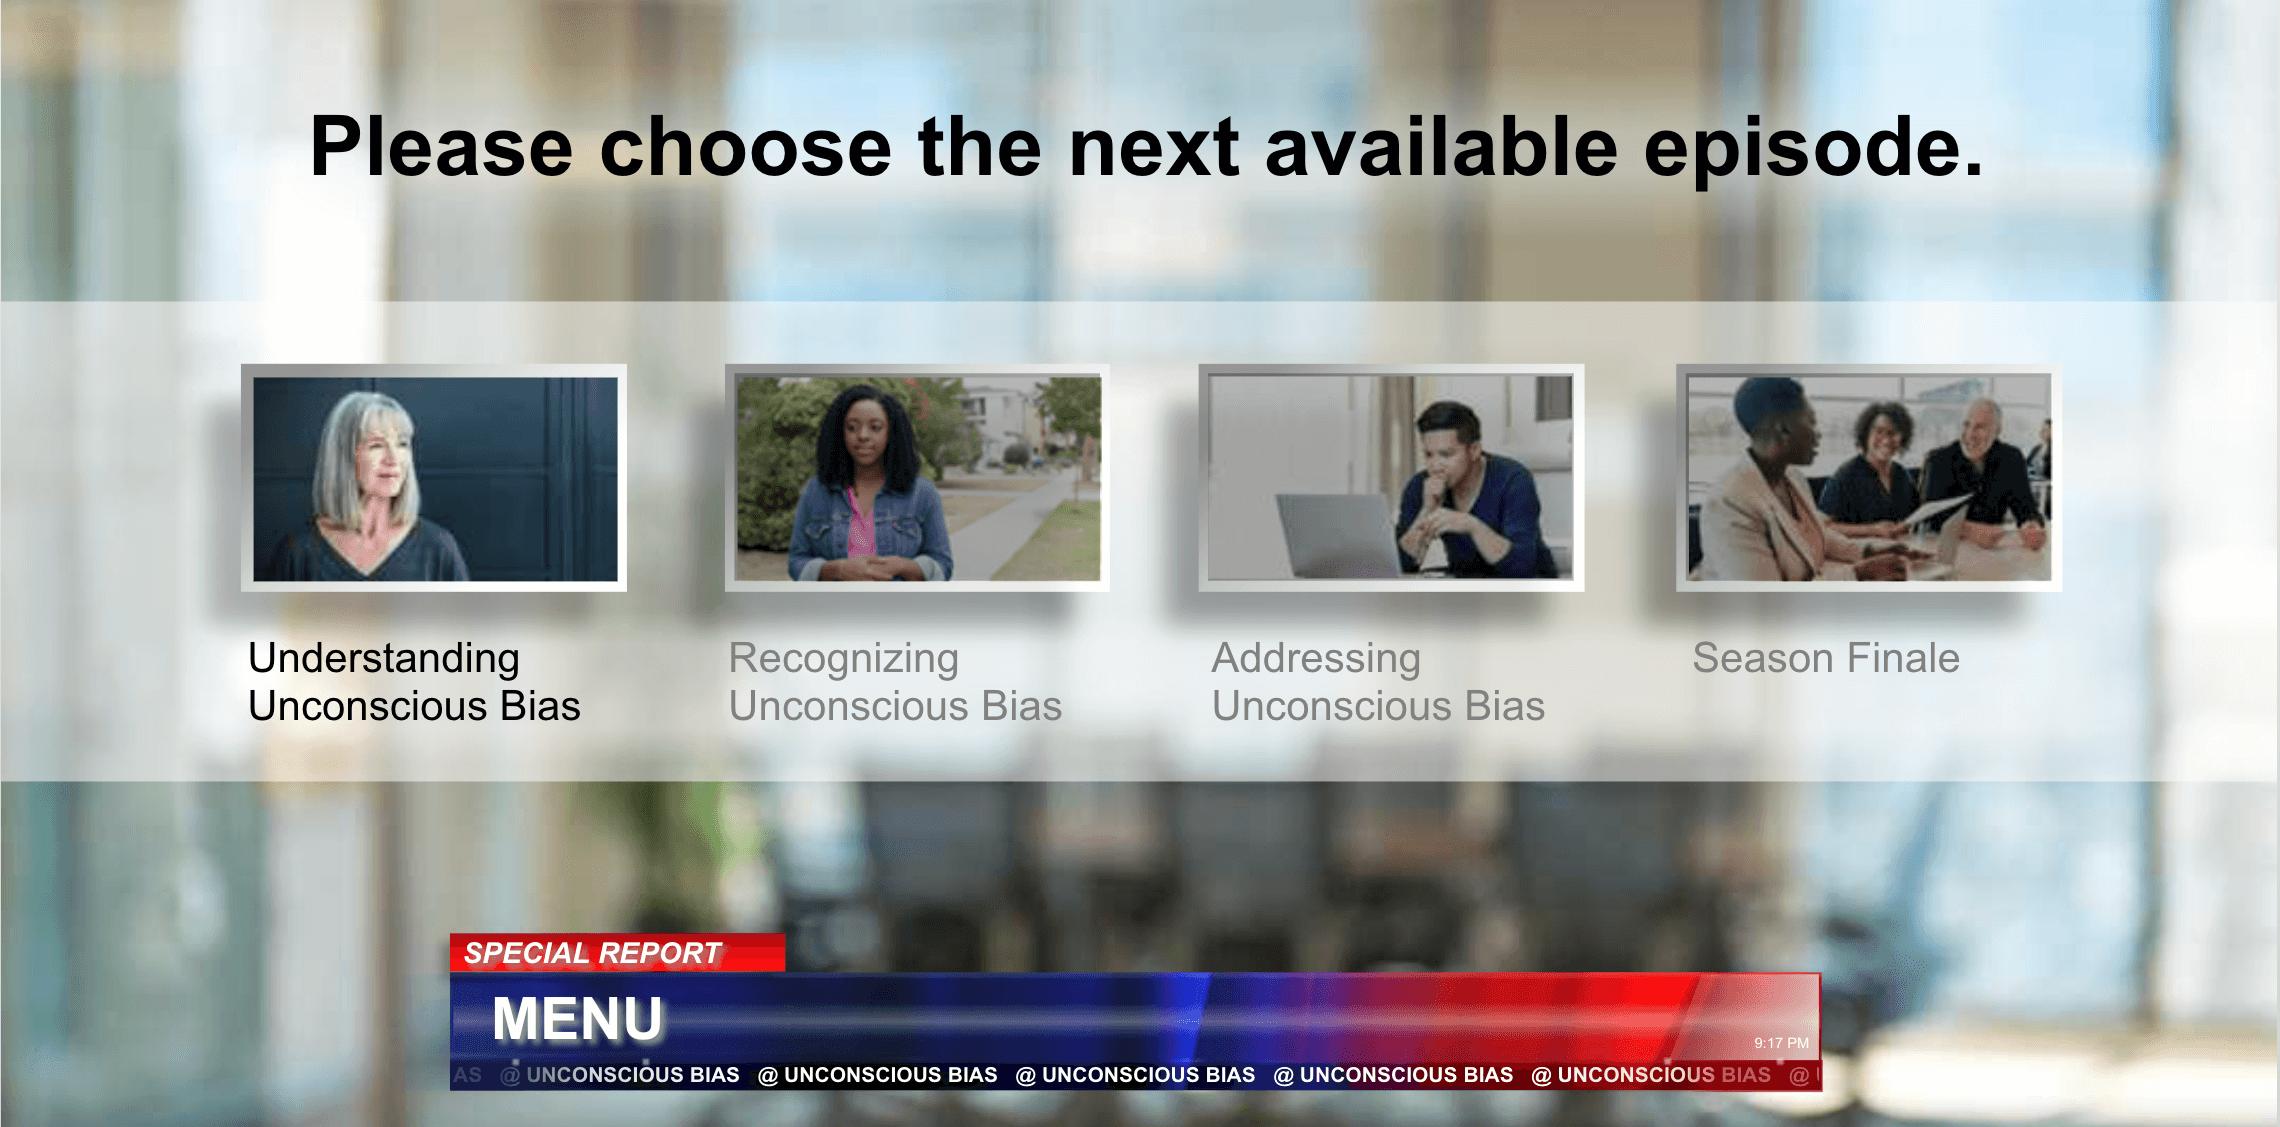 Unconscious bias e-learning course